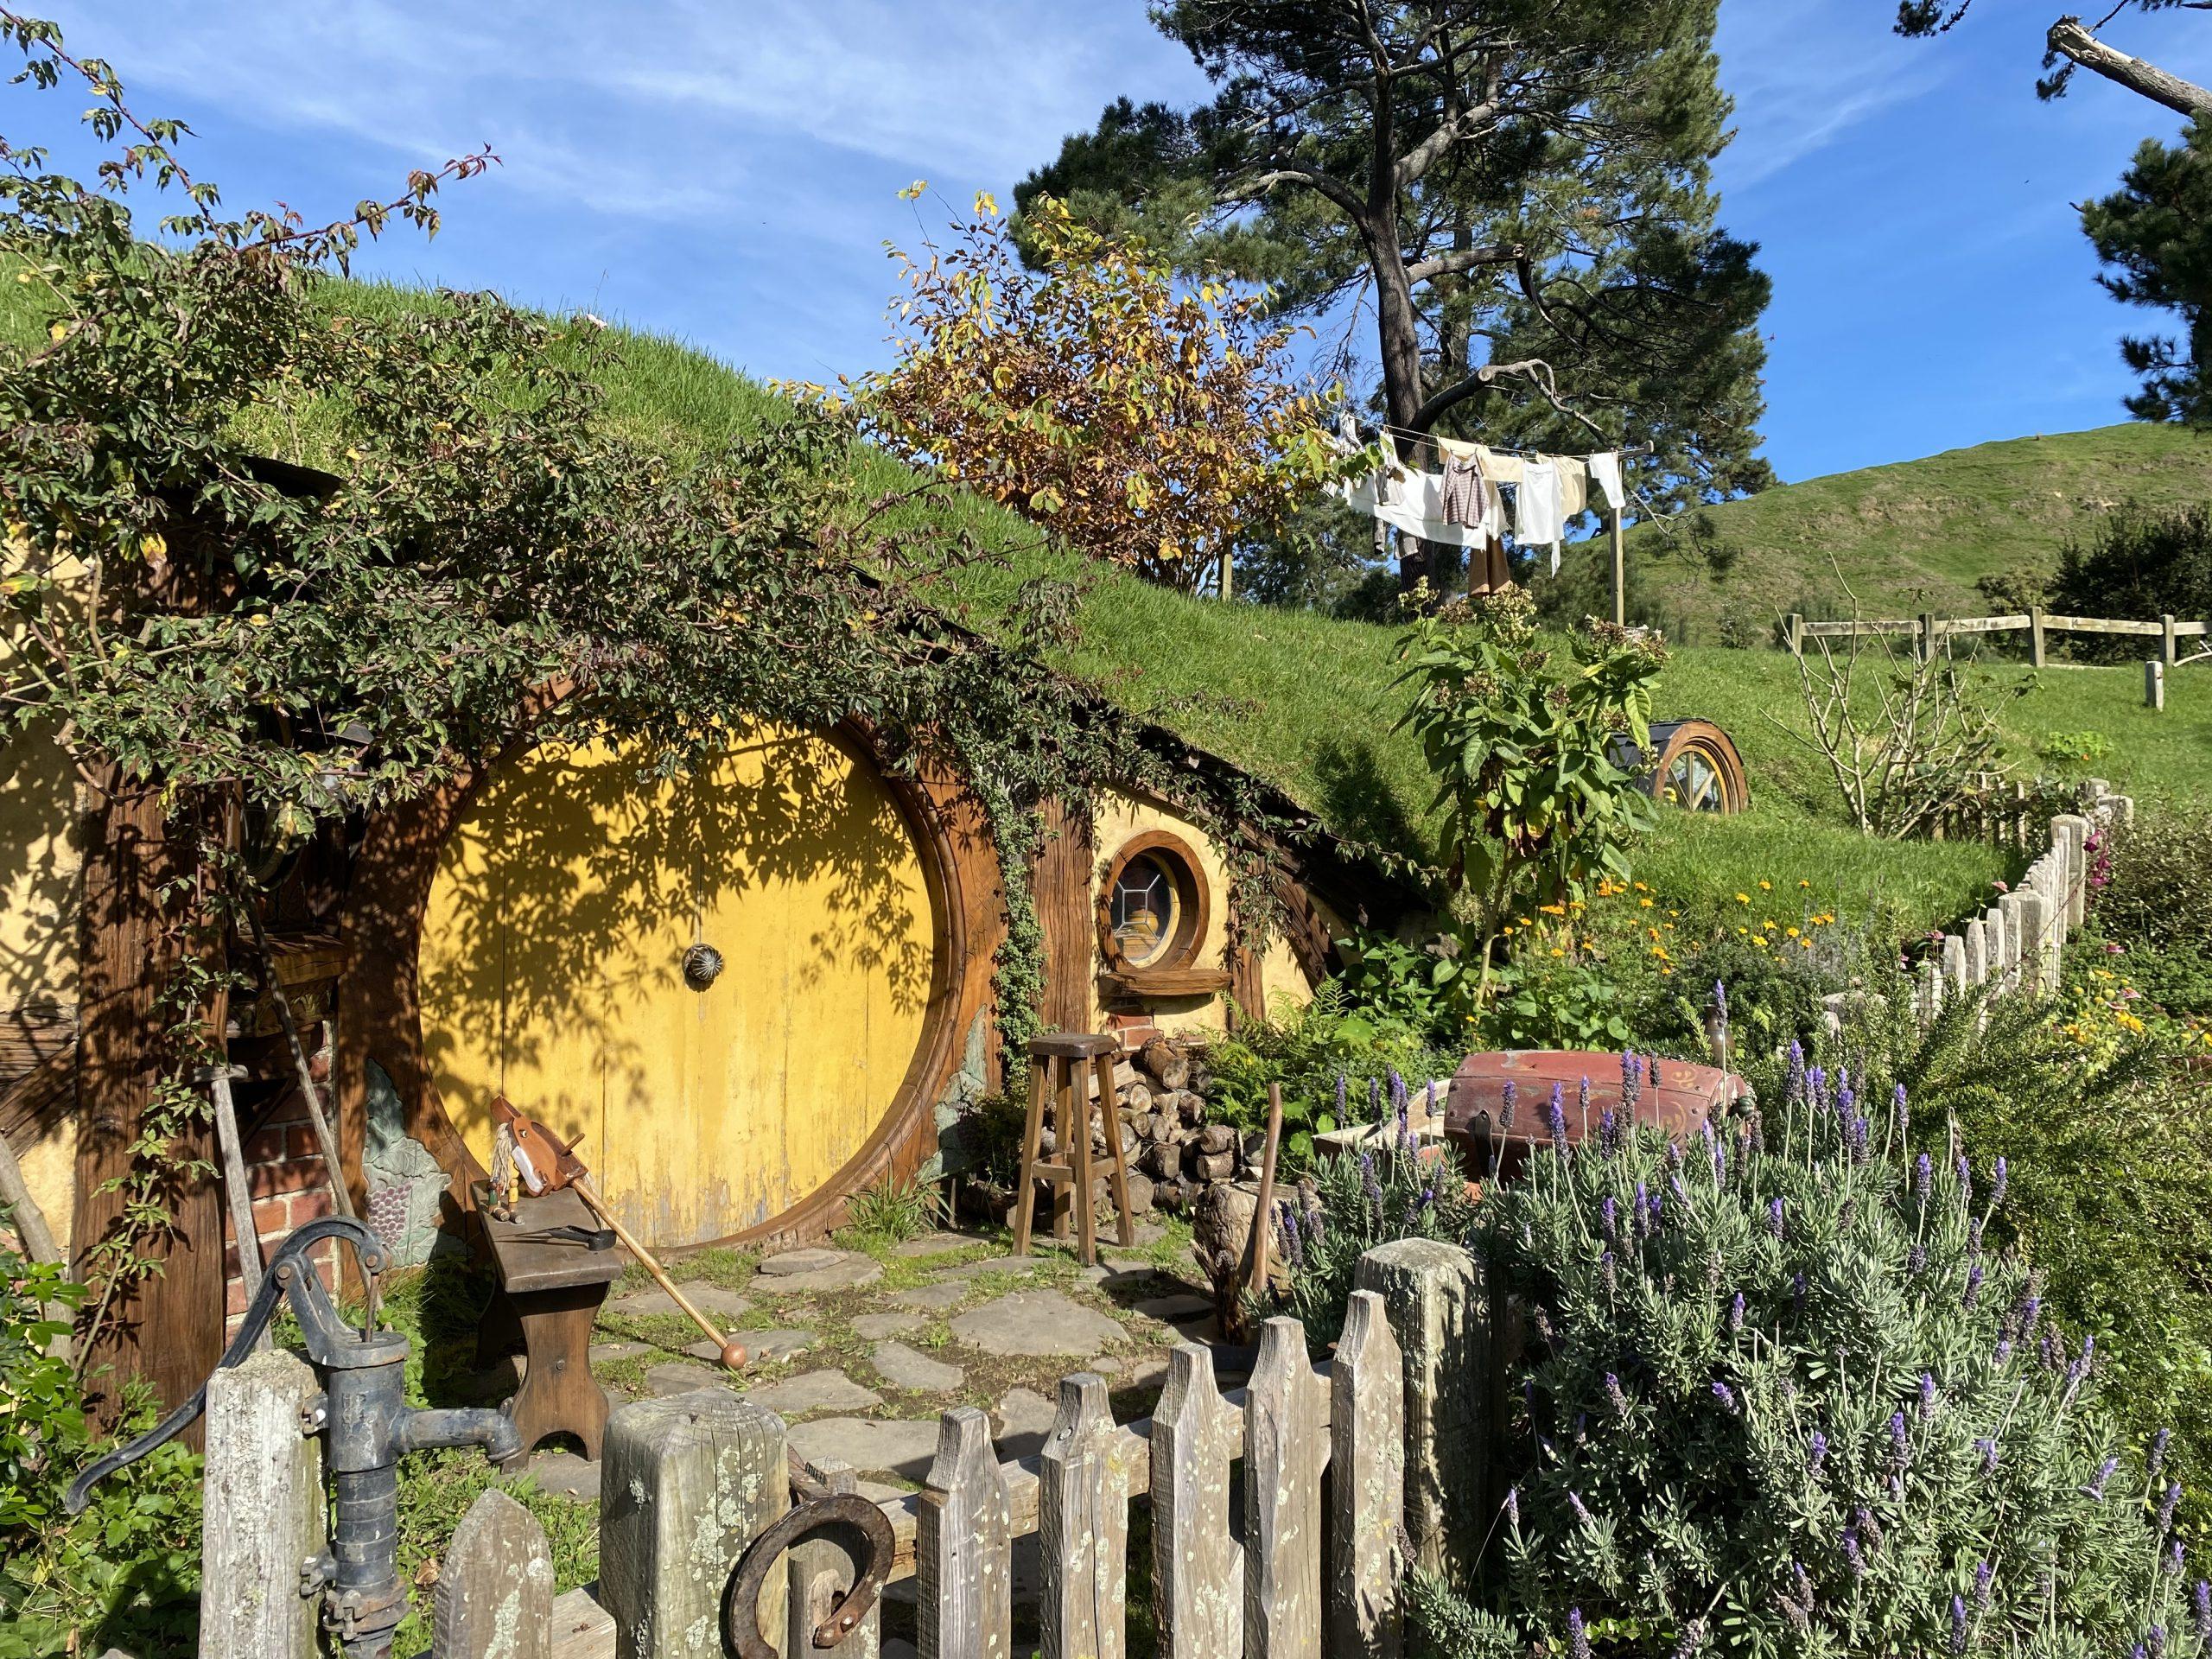 Samwise Gamgee's House at Hobbiton Movie Set